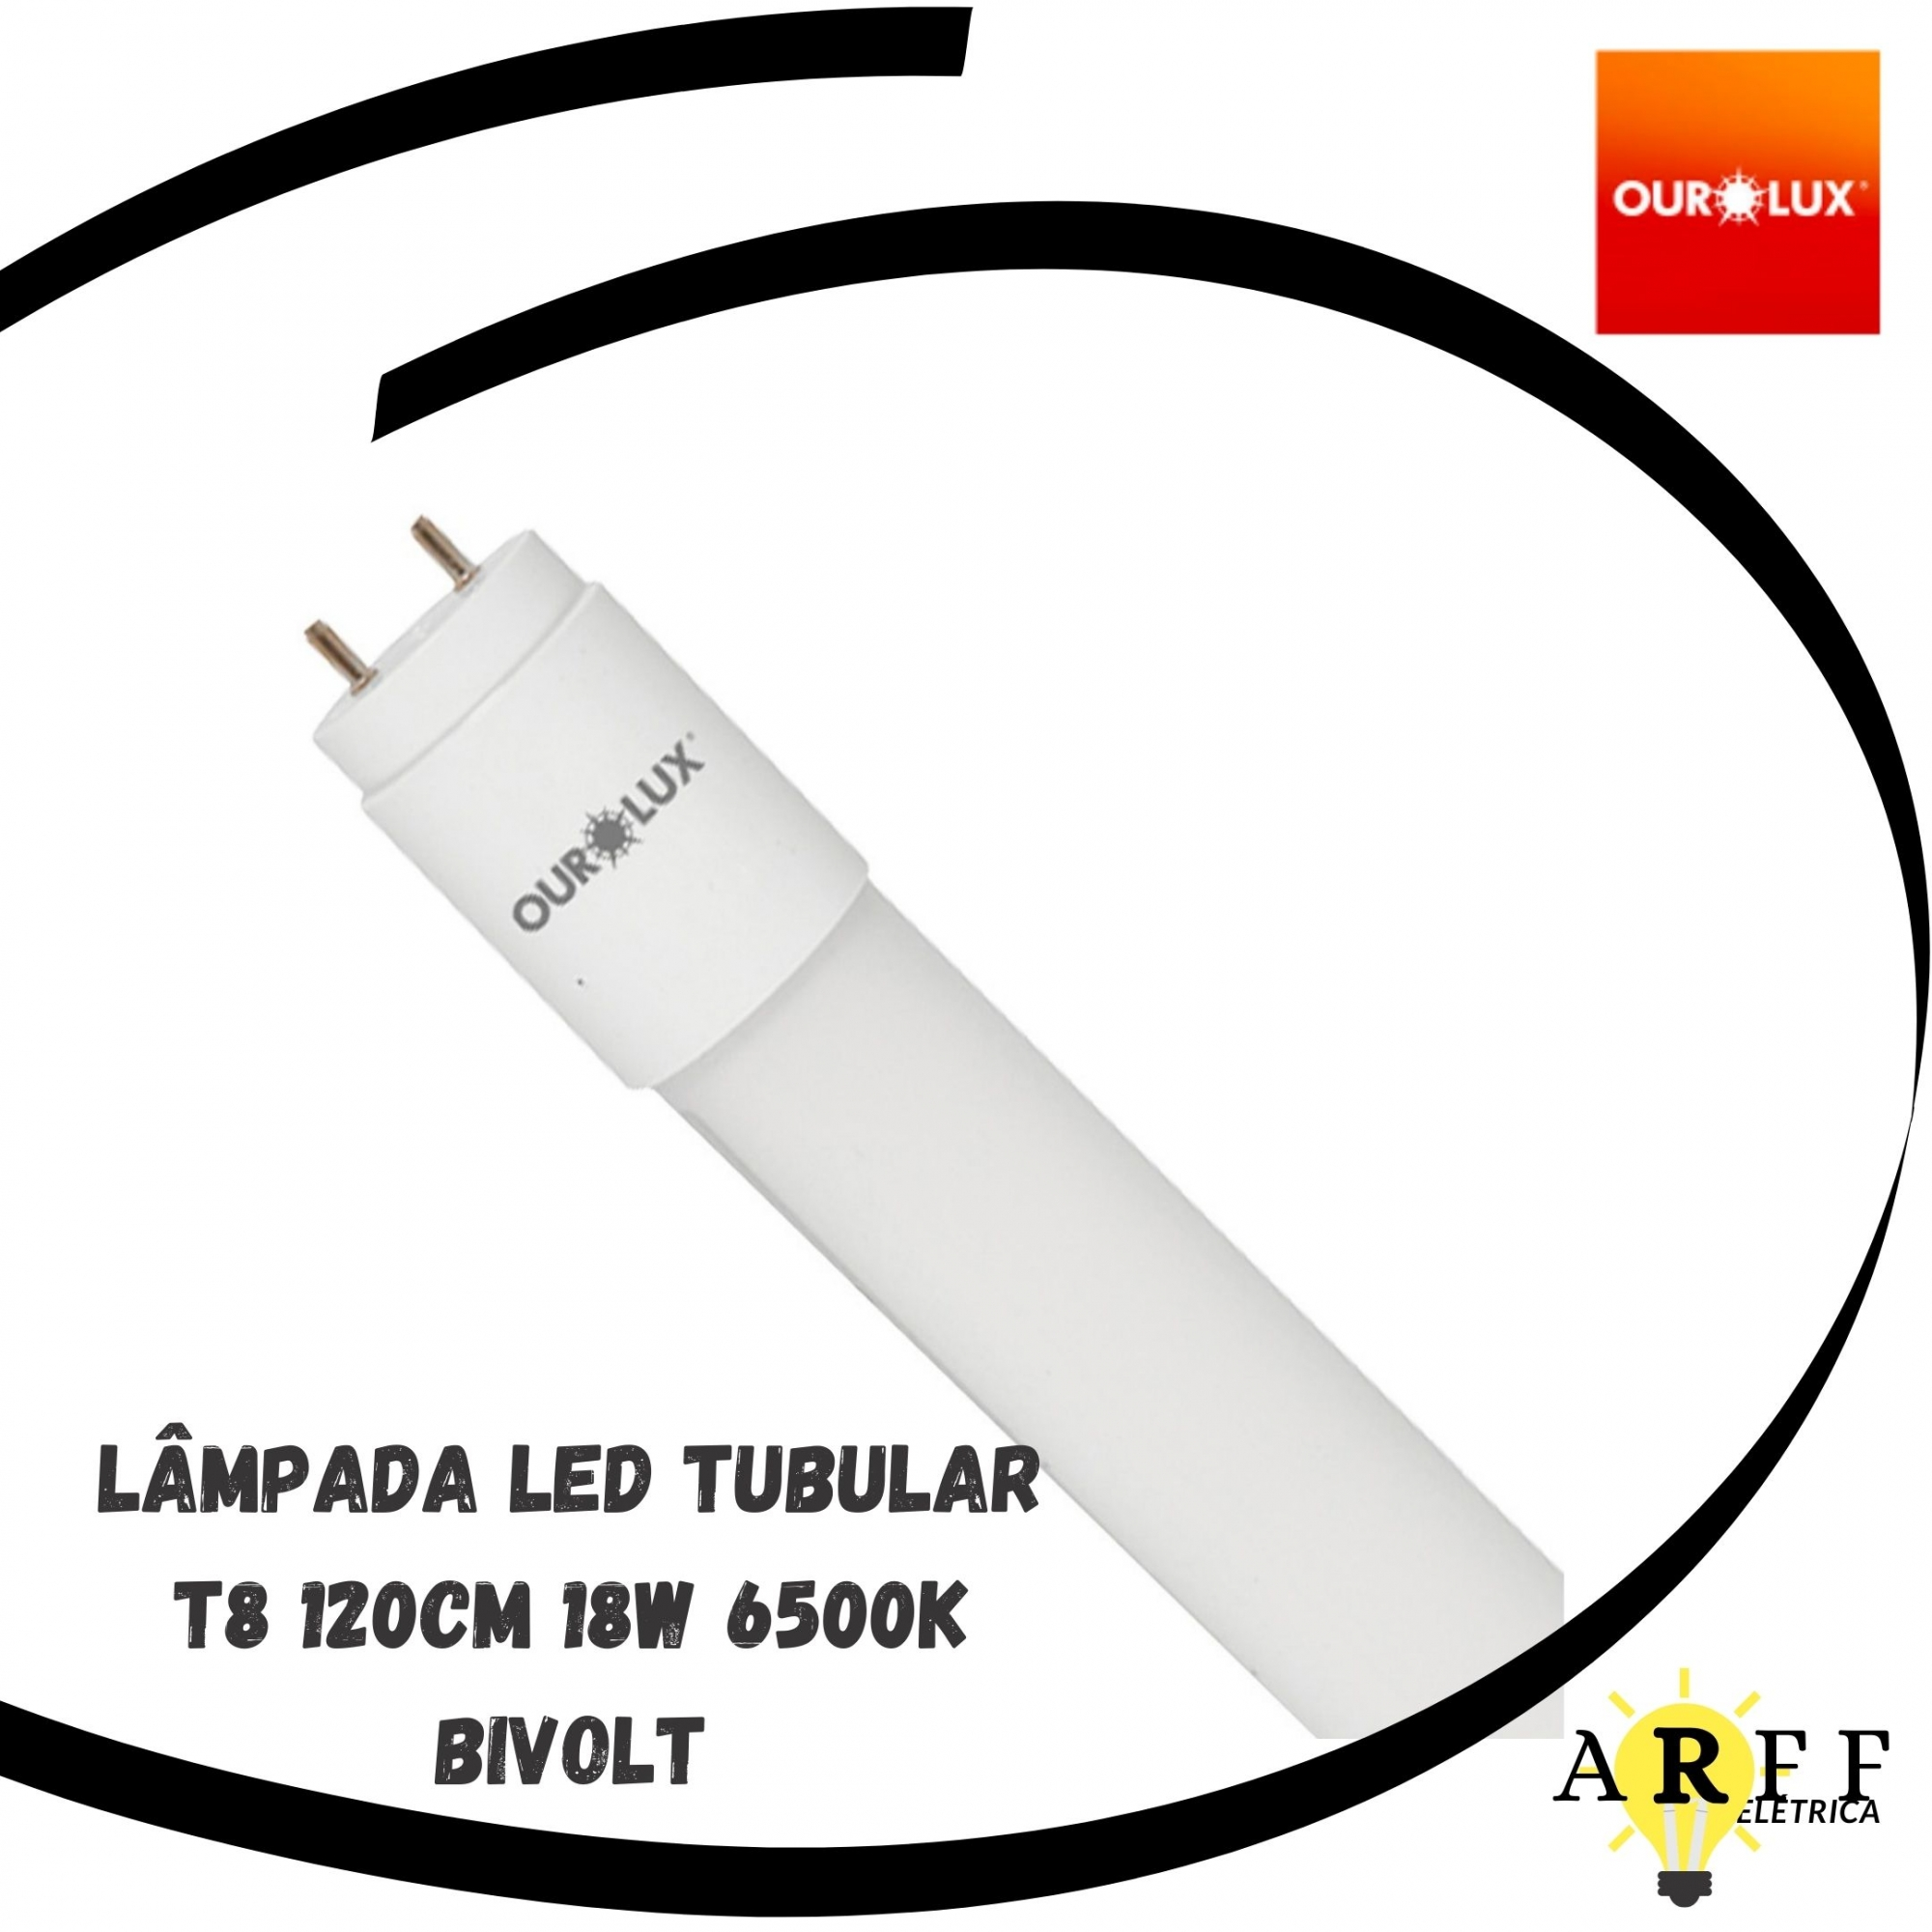 Lâmpada Led Tubular T8 120cm 18W 6500k Bivolt OUROLUX